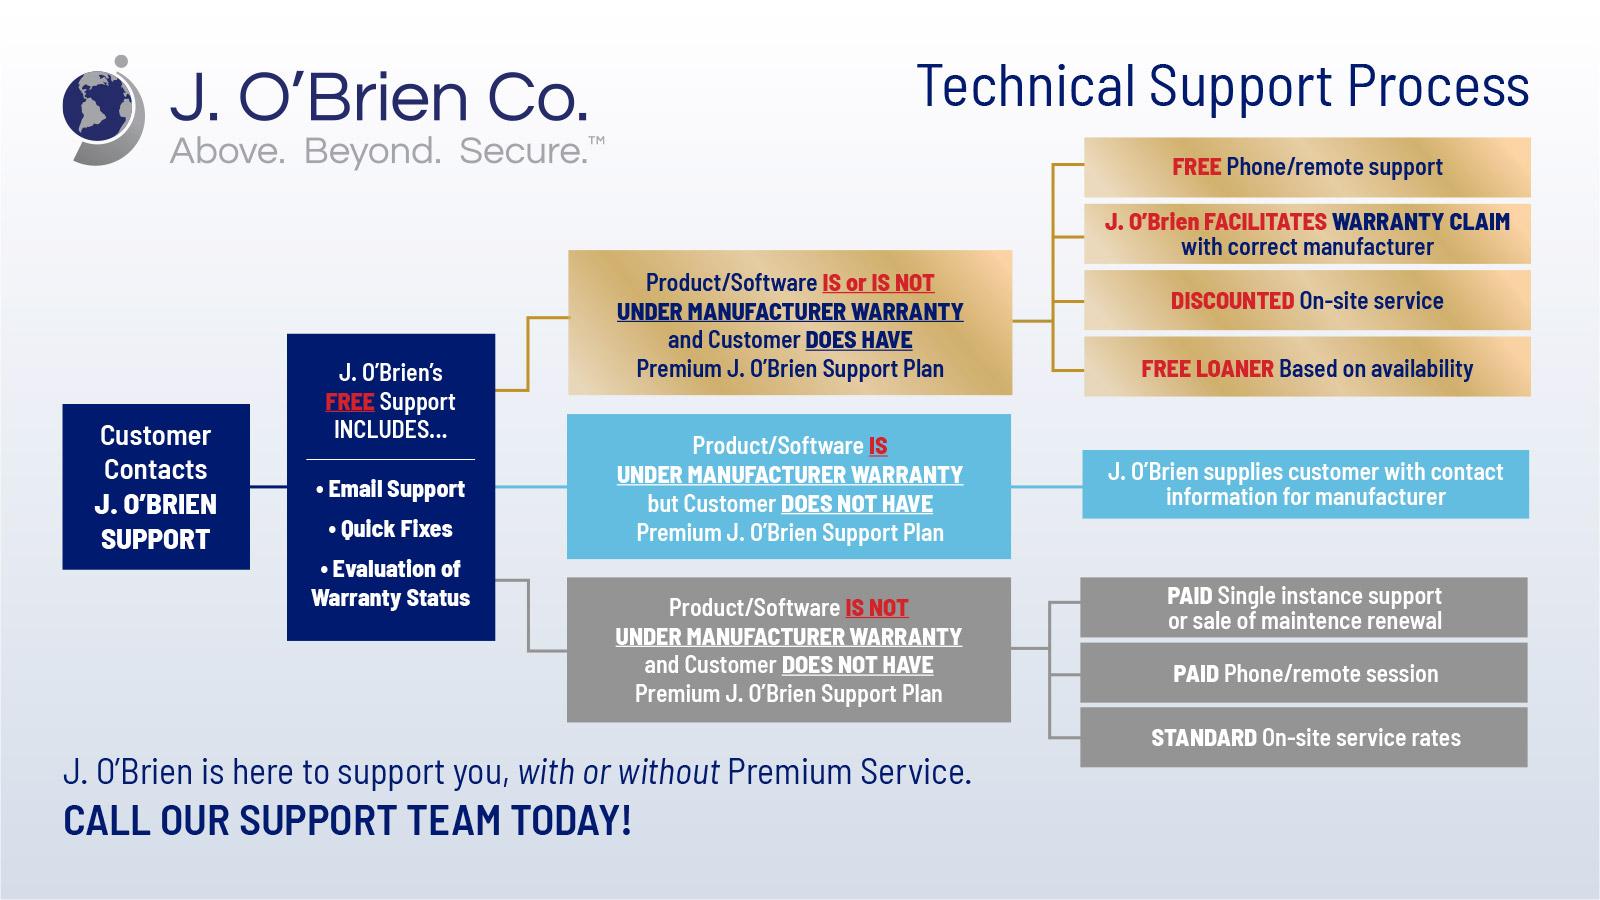 FARGO id card printer choose j. o'brien Support Process